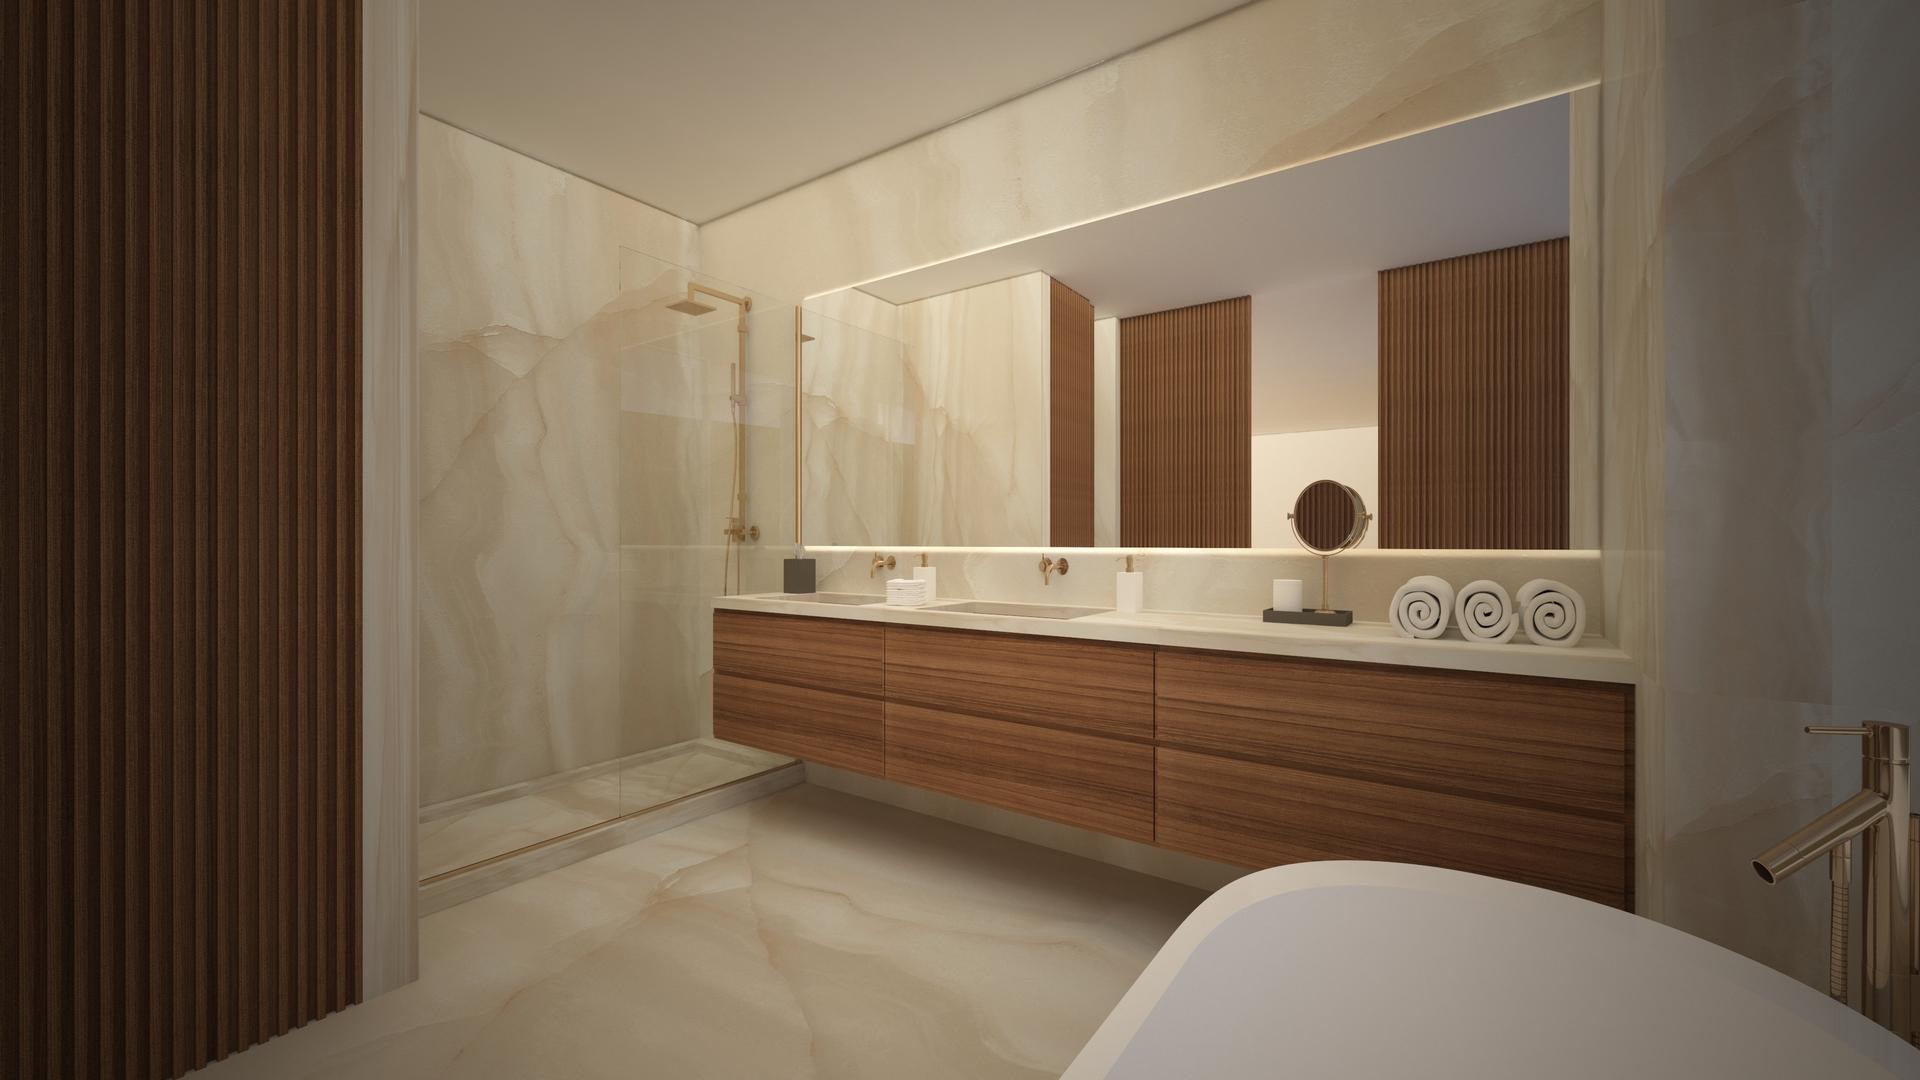 Penthouse - bathroom (Αντιγραφή)